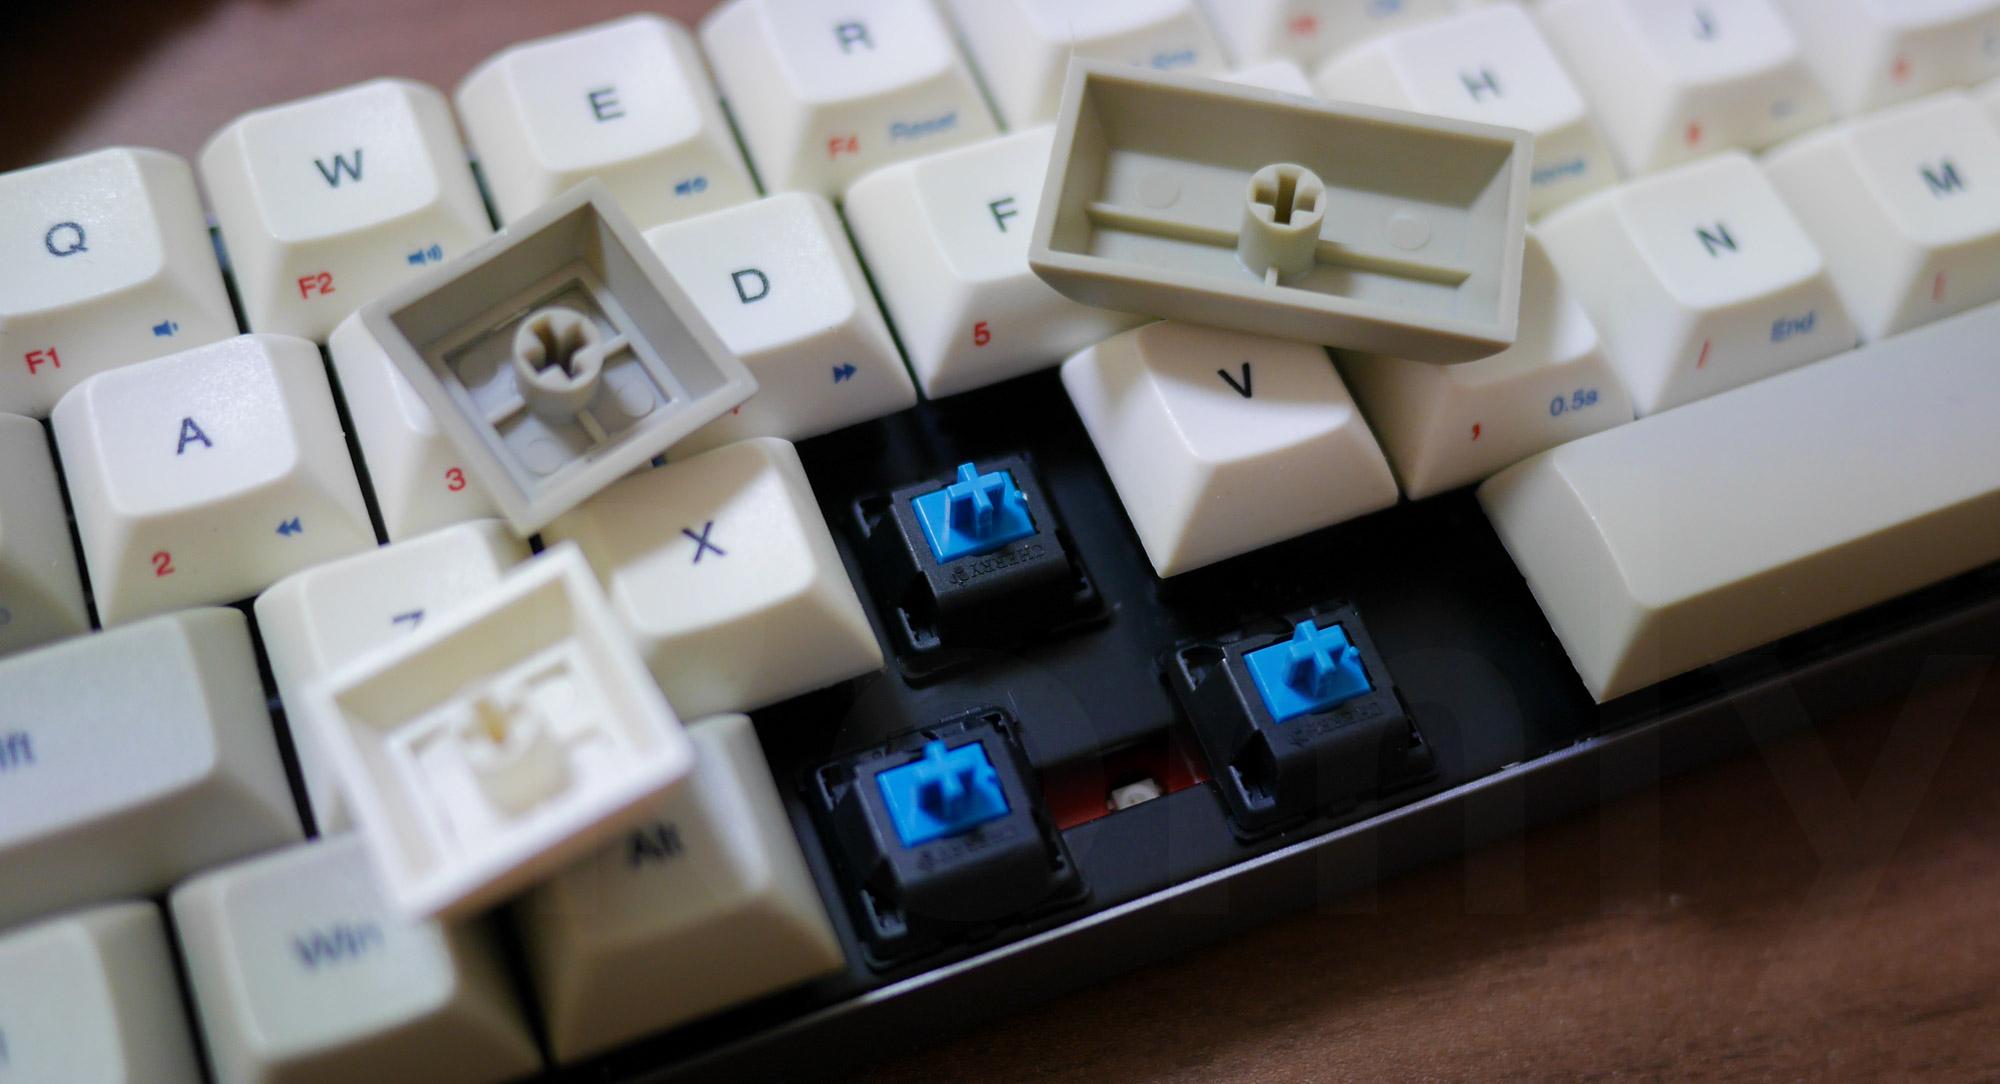 Vortex Core Cherry MX Blue Switch